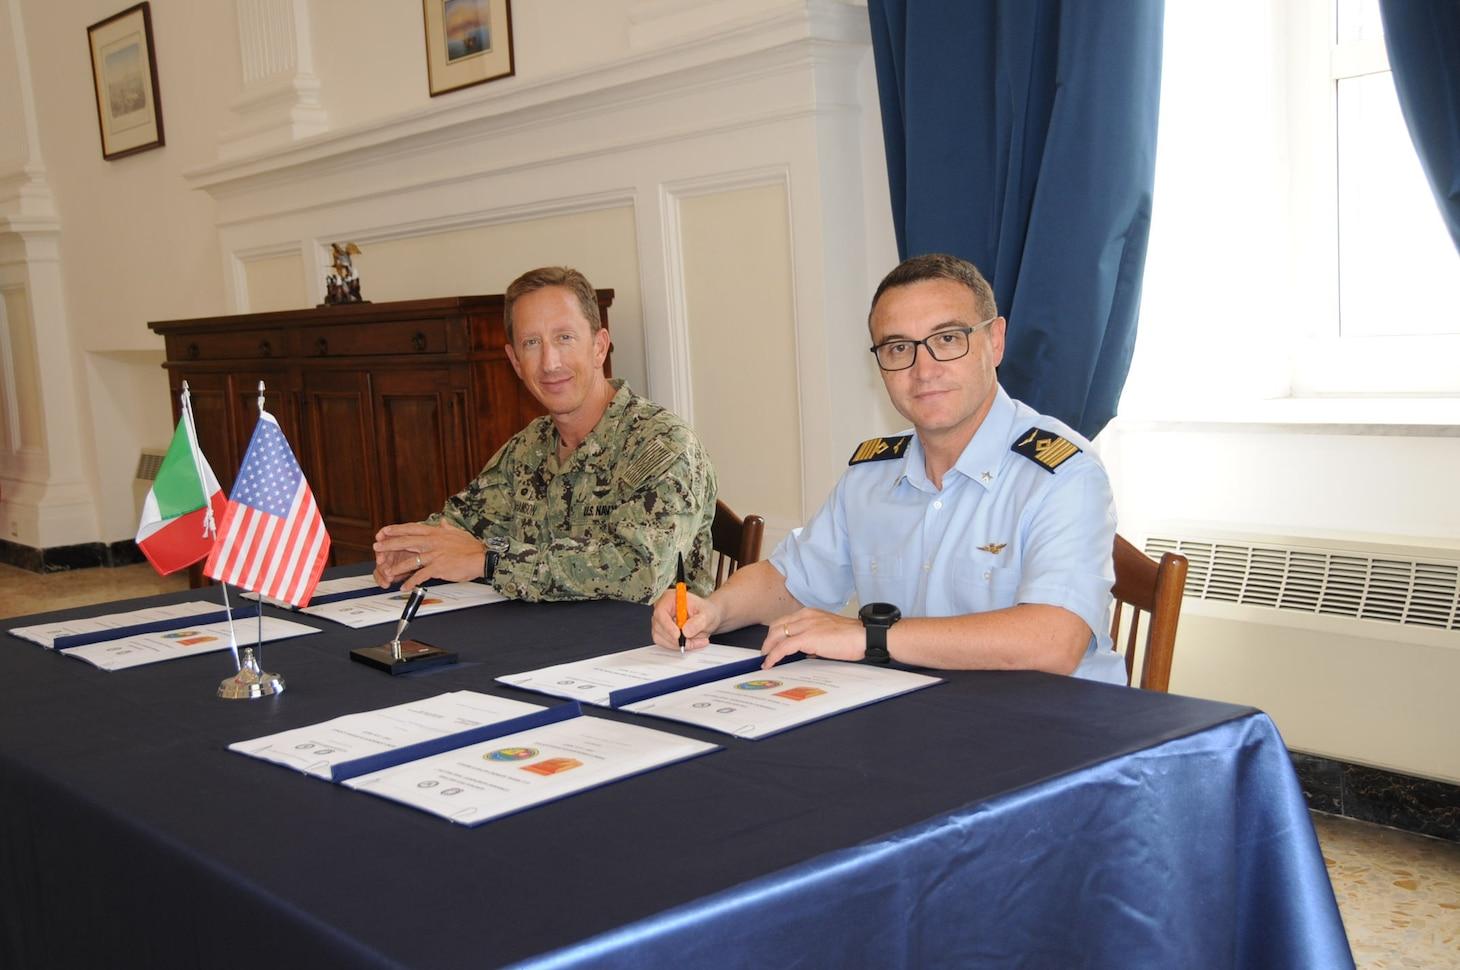 Naples Commanding Officer Capt. Todd Abrahamson, left, and Italian Base Commander Col. Stefano Ferramondo pose for a picture